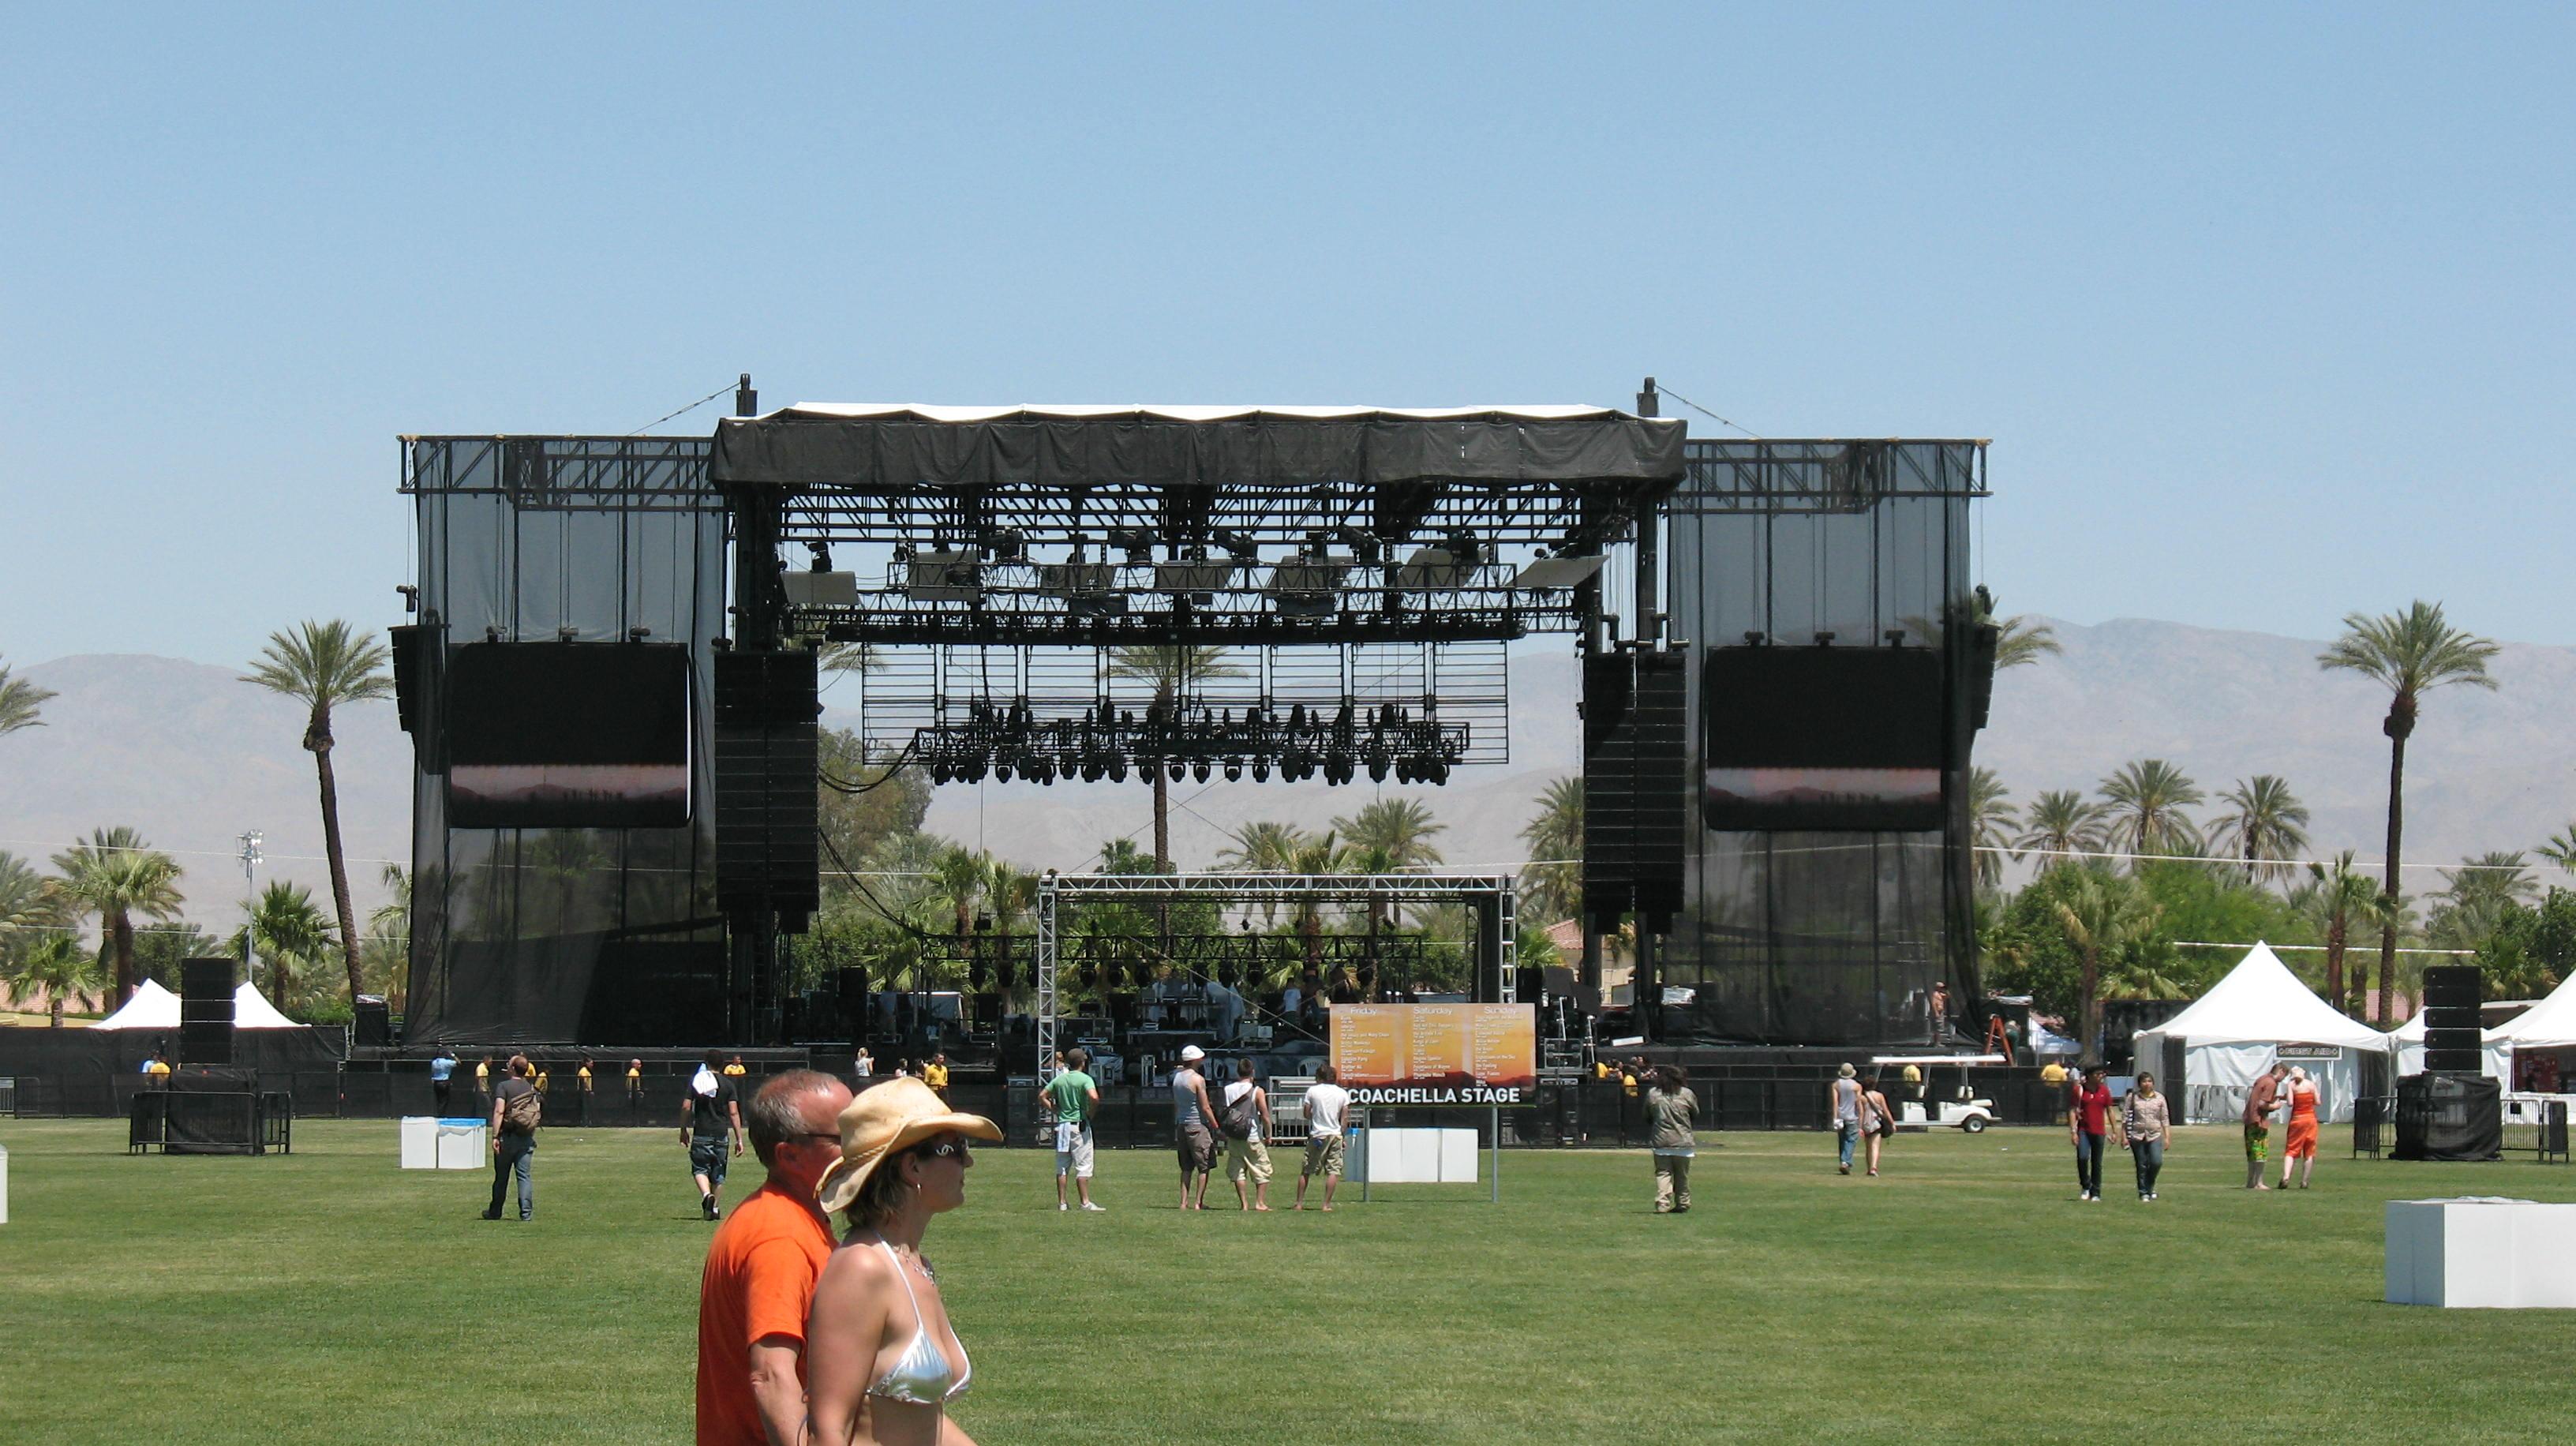 COVID-19: Music festival Coachella postponed amid outbreak fears